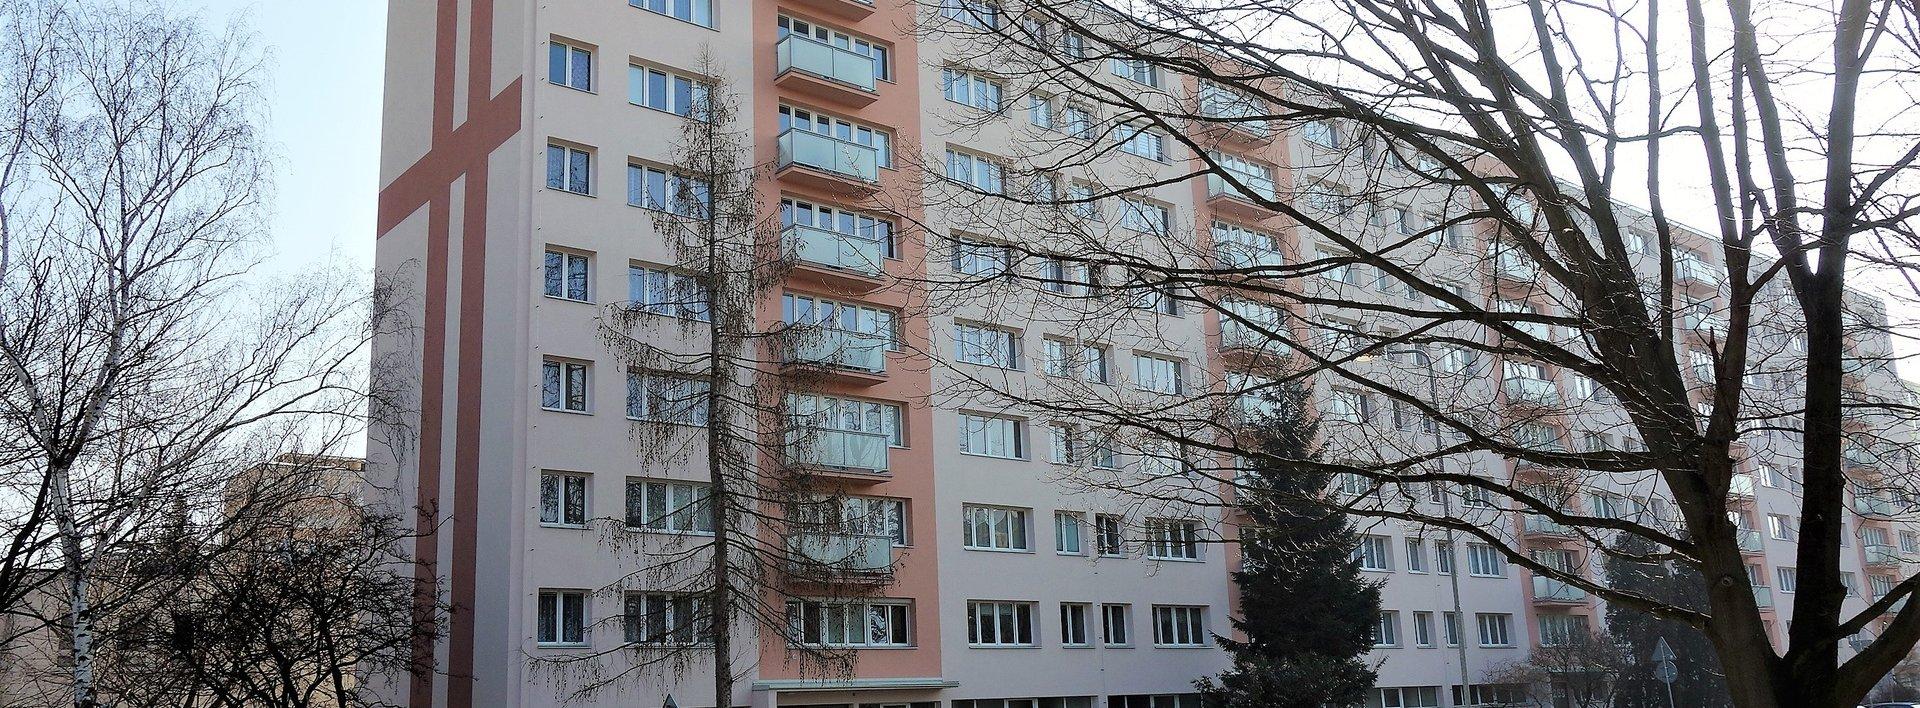 Byt 1+kk, 30 m² - Pardubice (Polabiny), Ev.č.: N48368